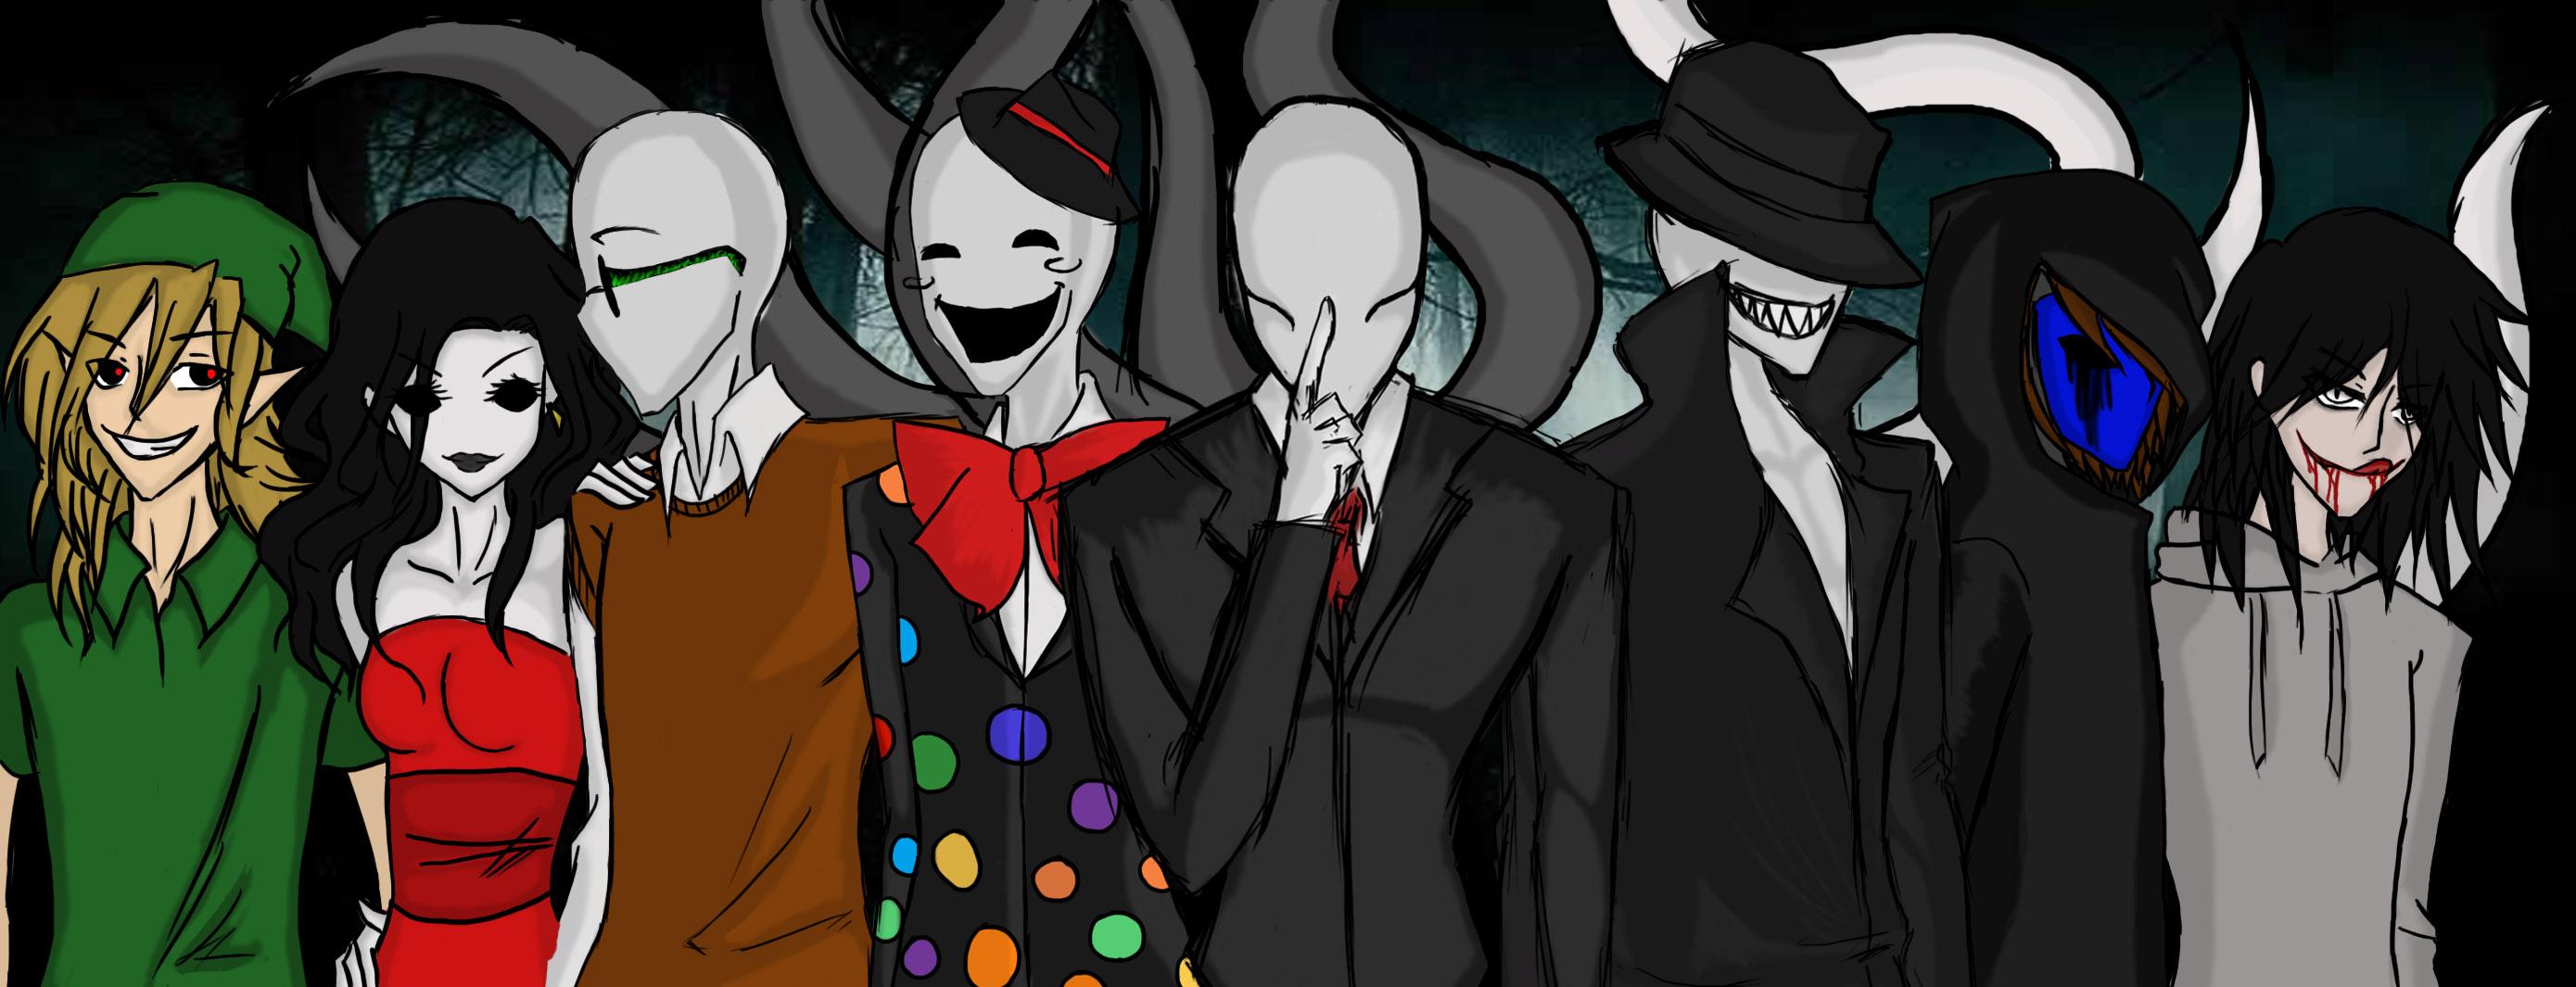 Free Creepypasta Slenderman Brothers